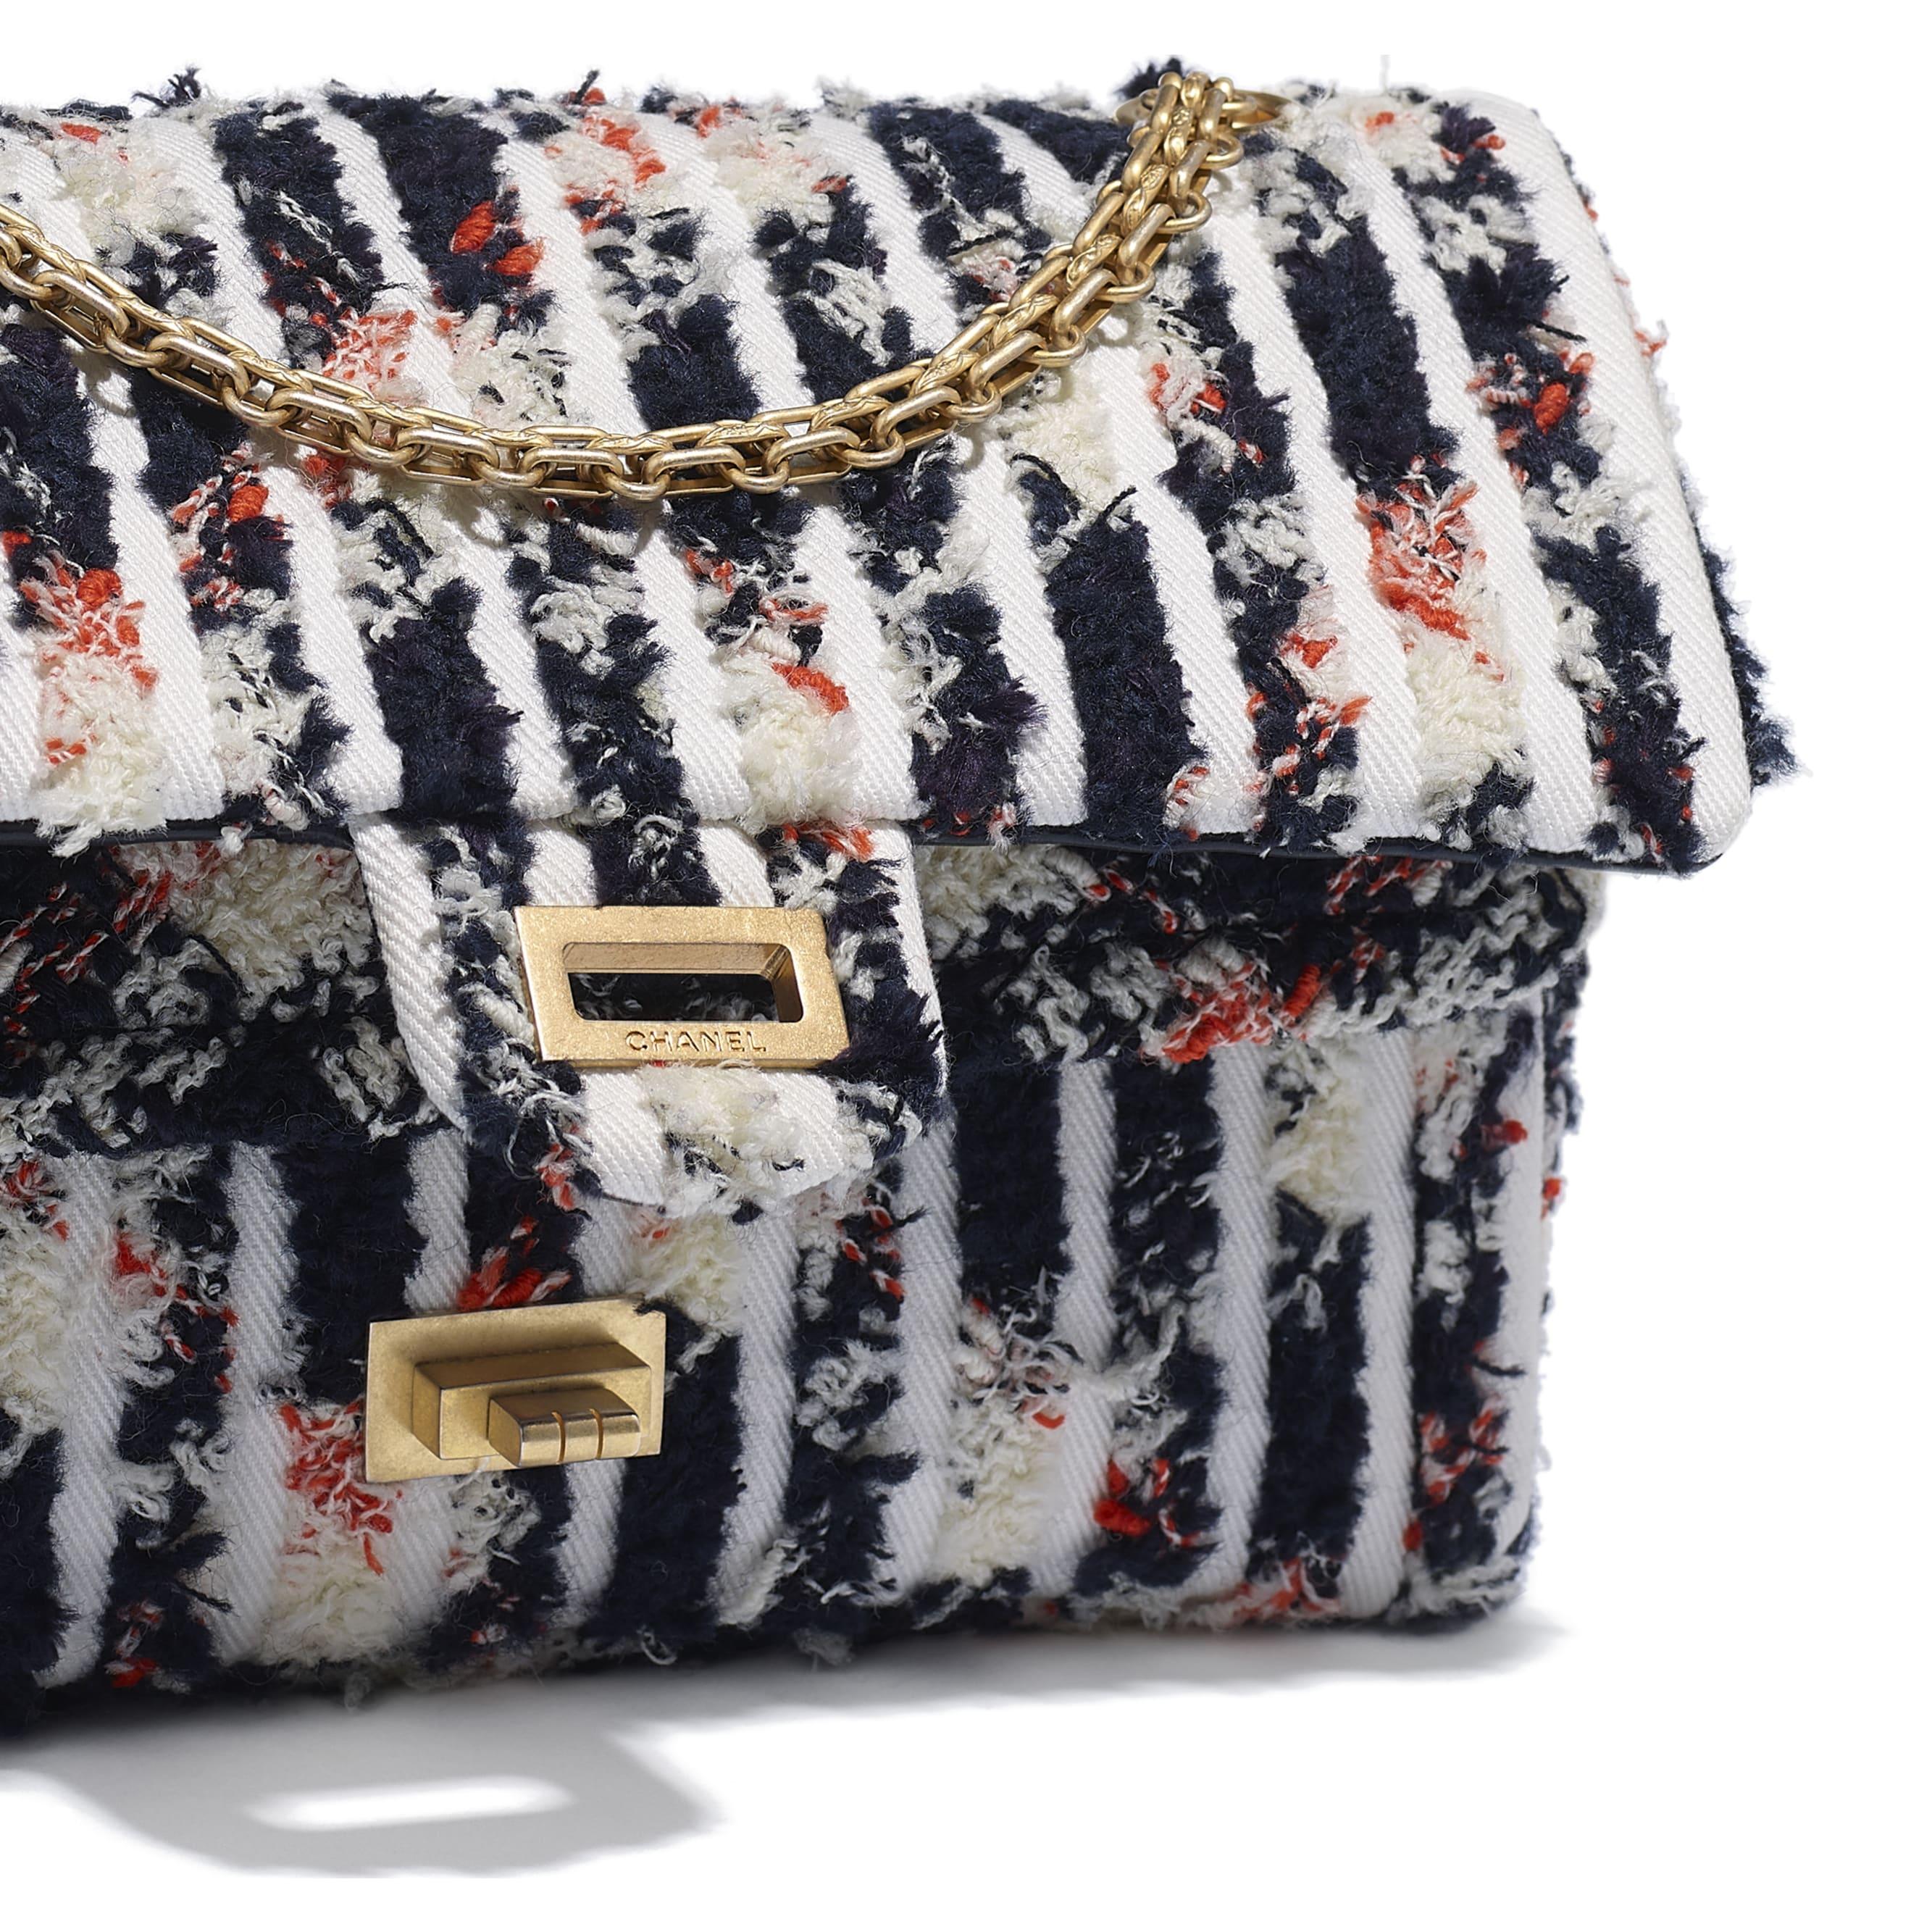 2.55 Handbag - Ecru, Navy Blue, Orange & White - Wool Tweed, Denim & Gold-Tone Metal - Extra view - see standard sized version